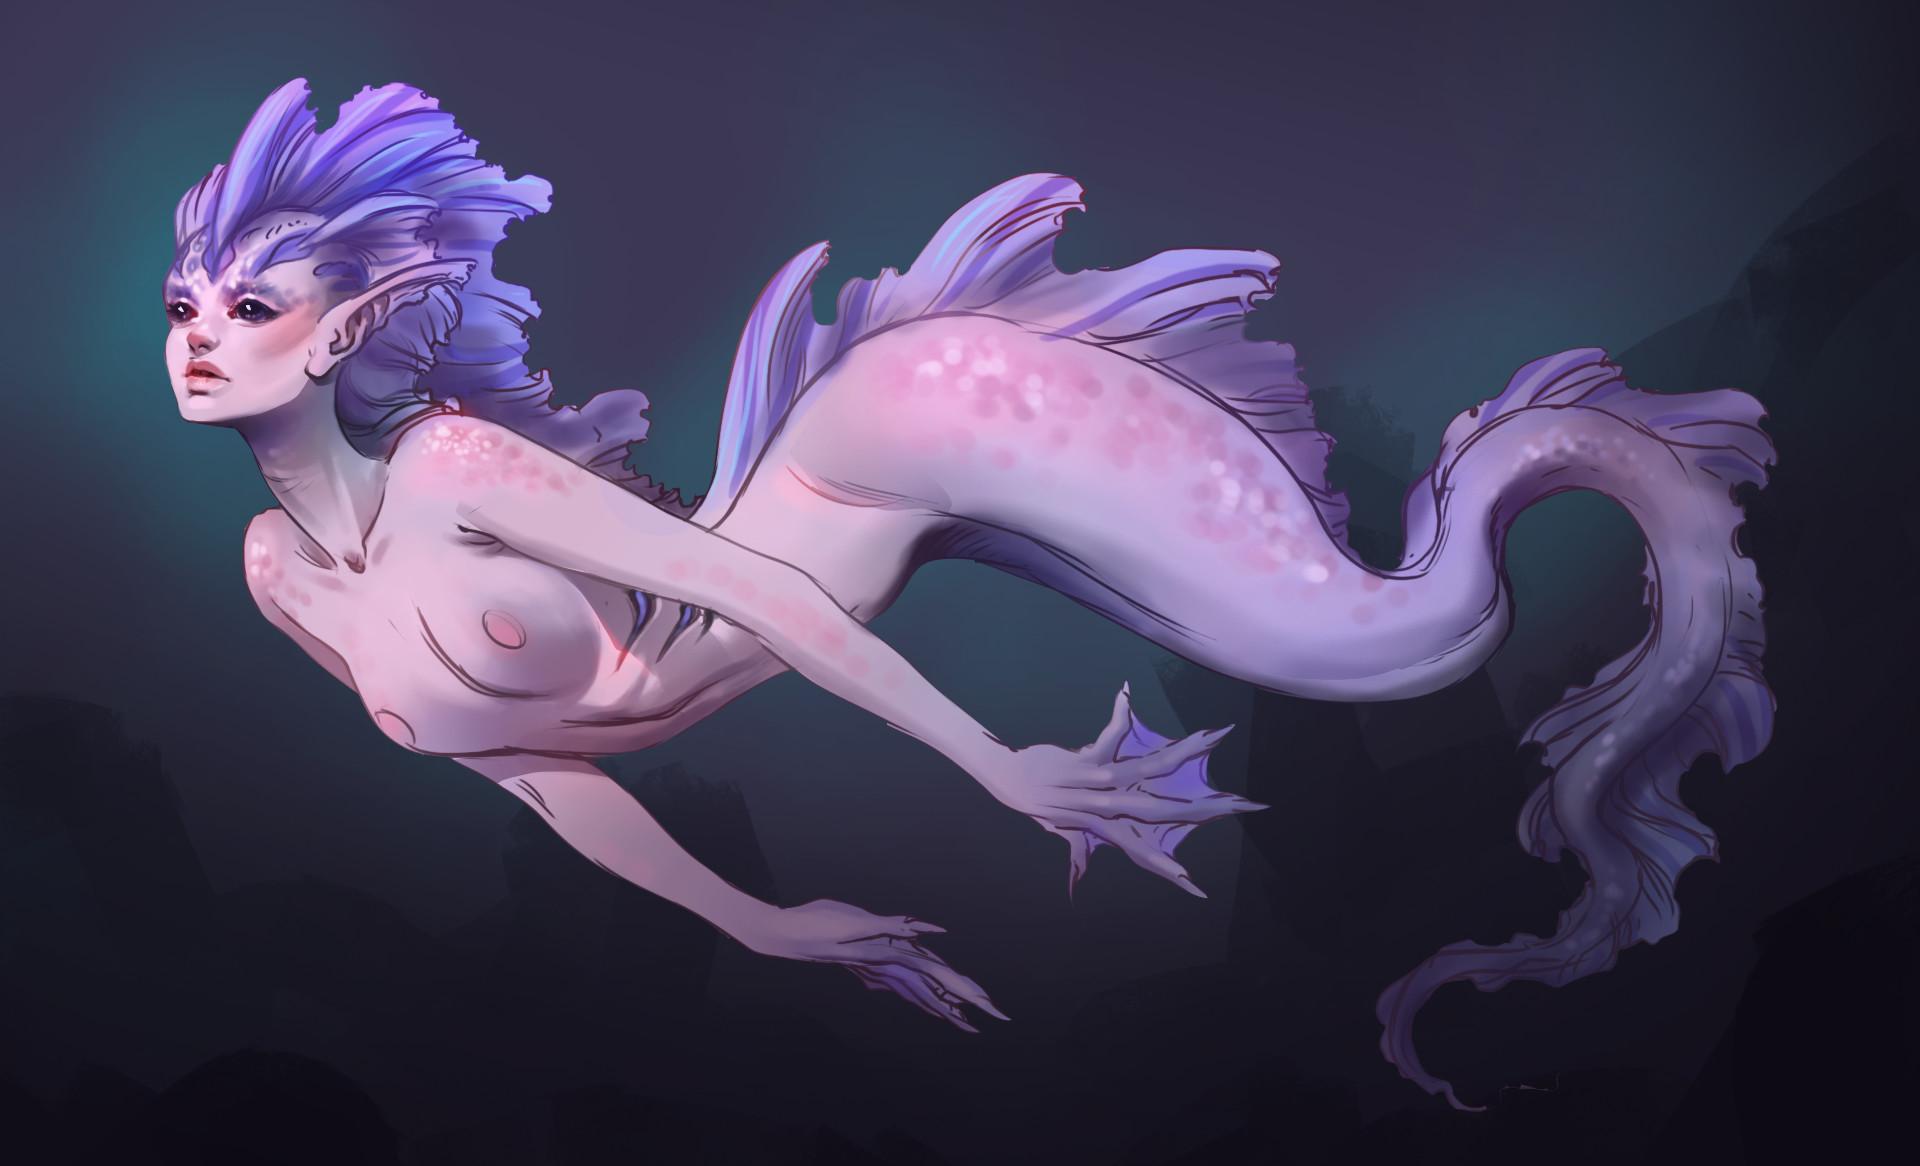 Moniek schilder mermaid